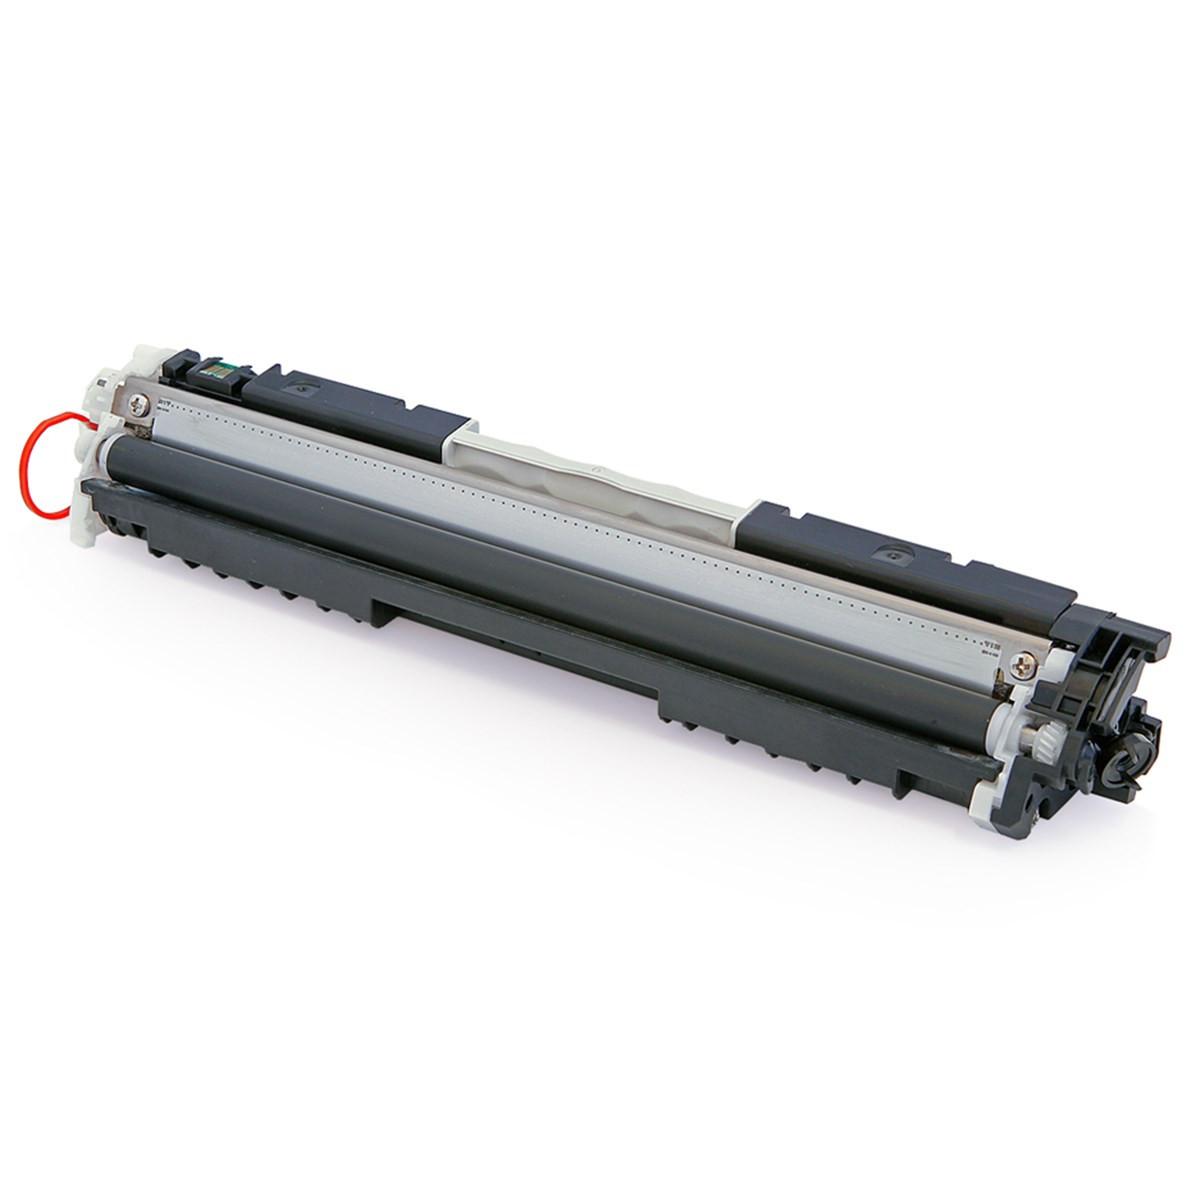 Toner Compatível HP CE311A Universal 311A 126A Ciano | CP1020 CP1020WN CP1025 M175A | Premium 1k